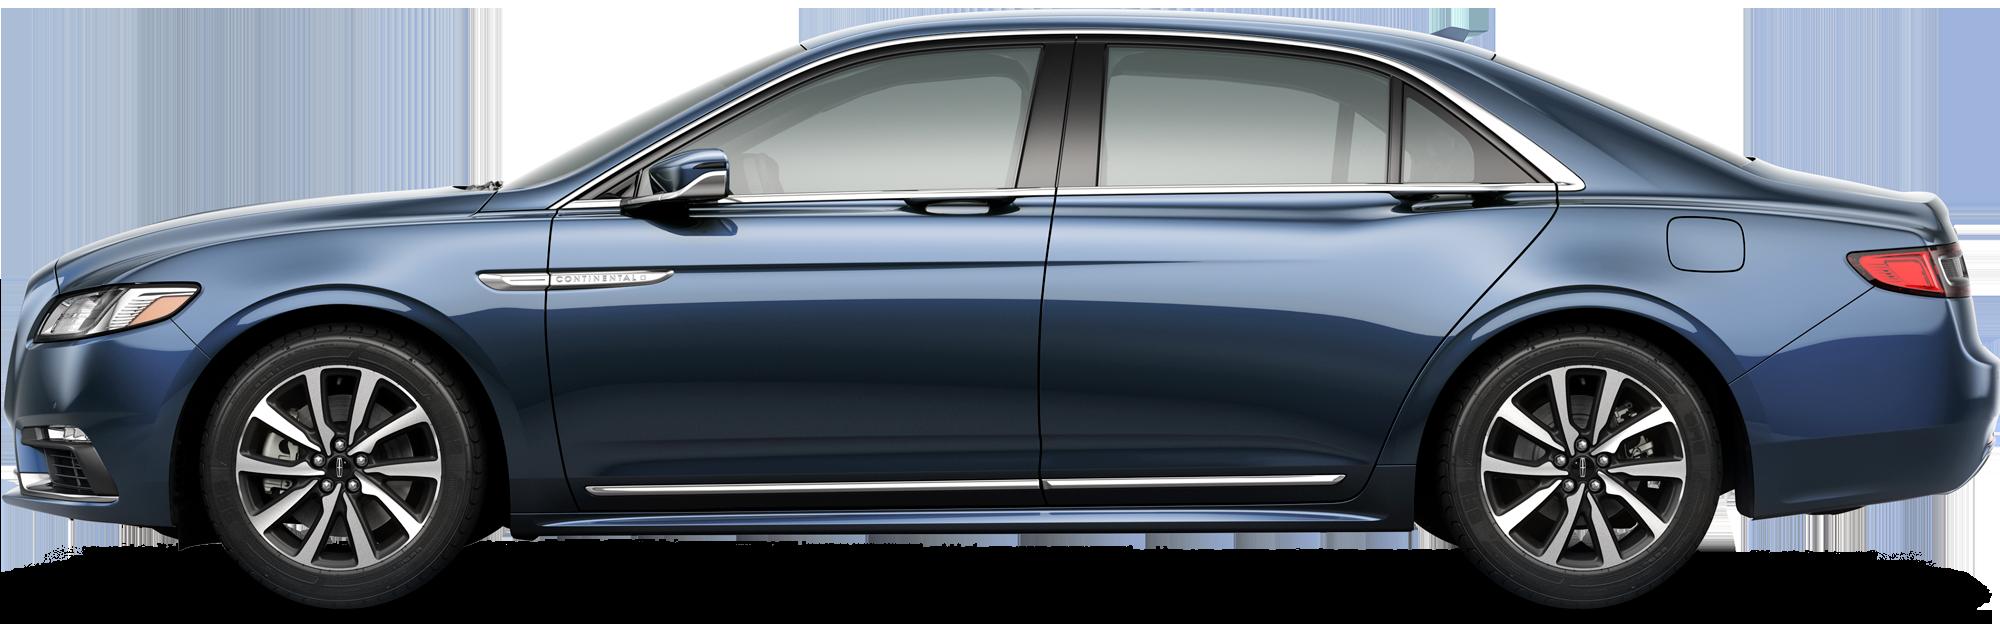 2020 Lincoln Continental Sedan Standard